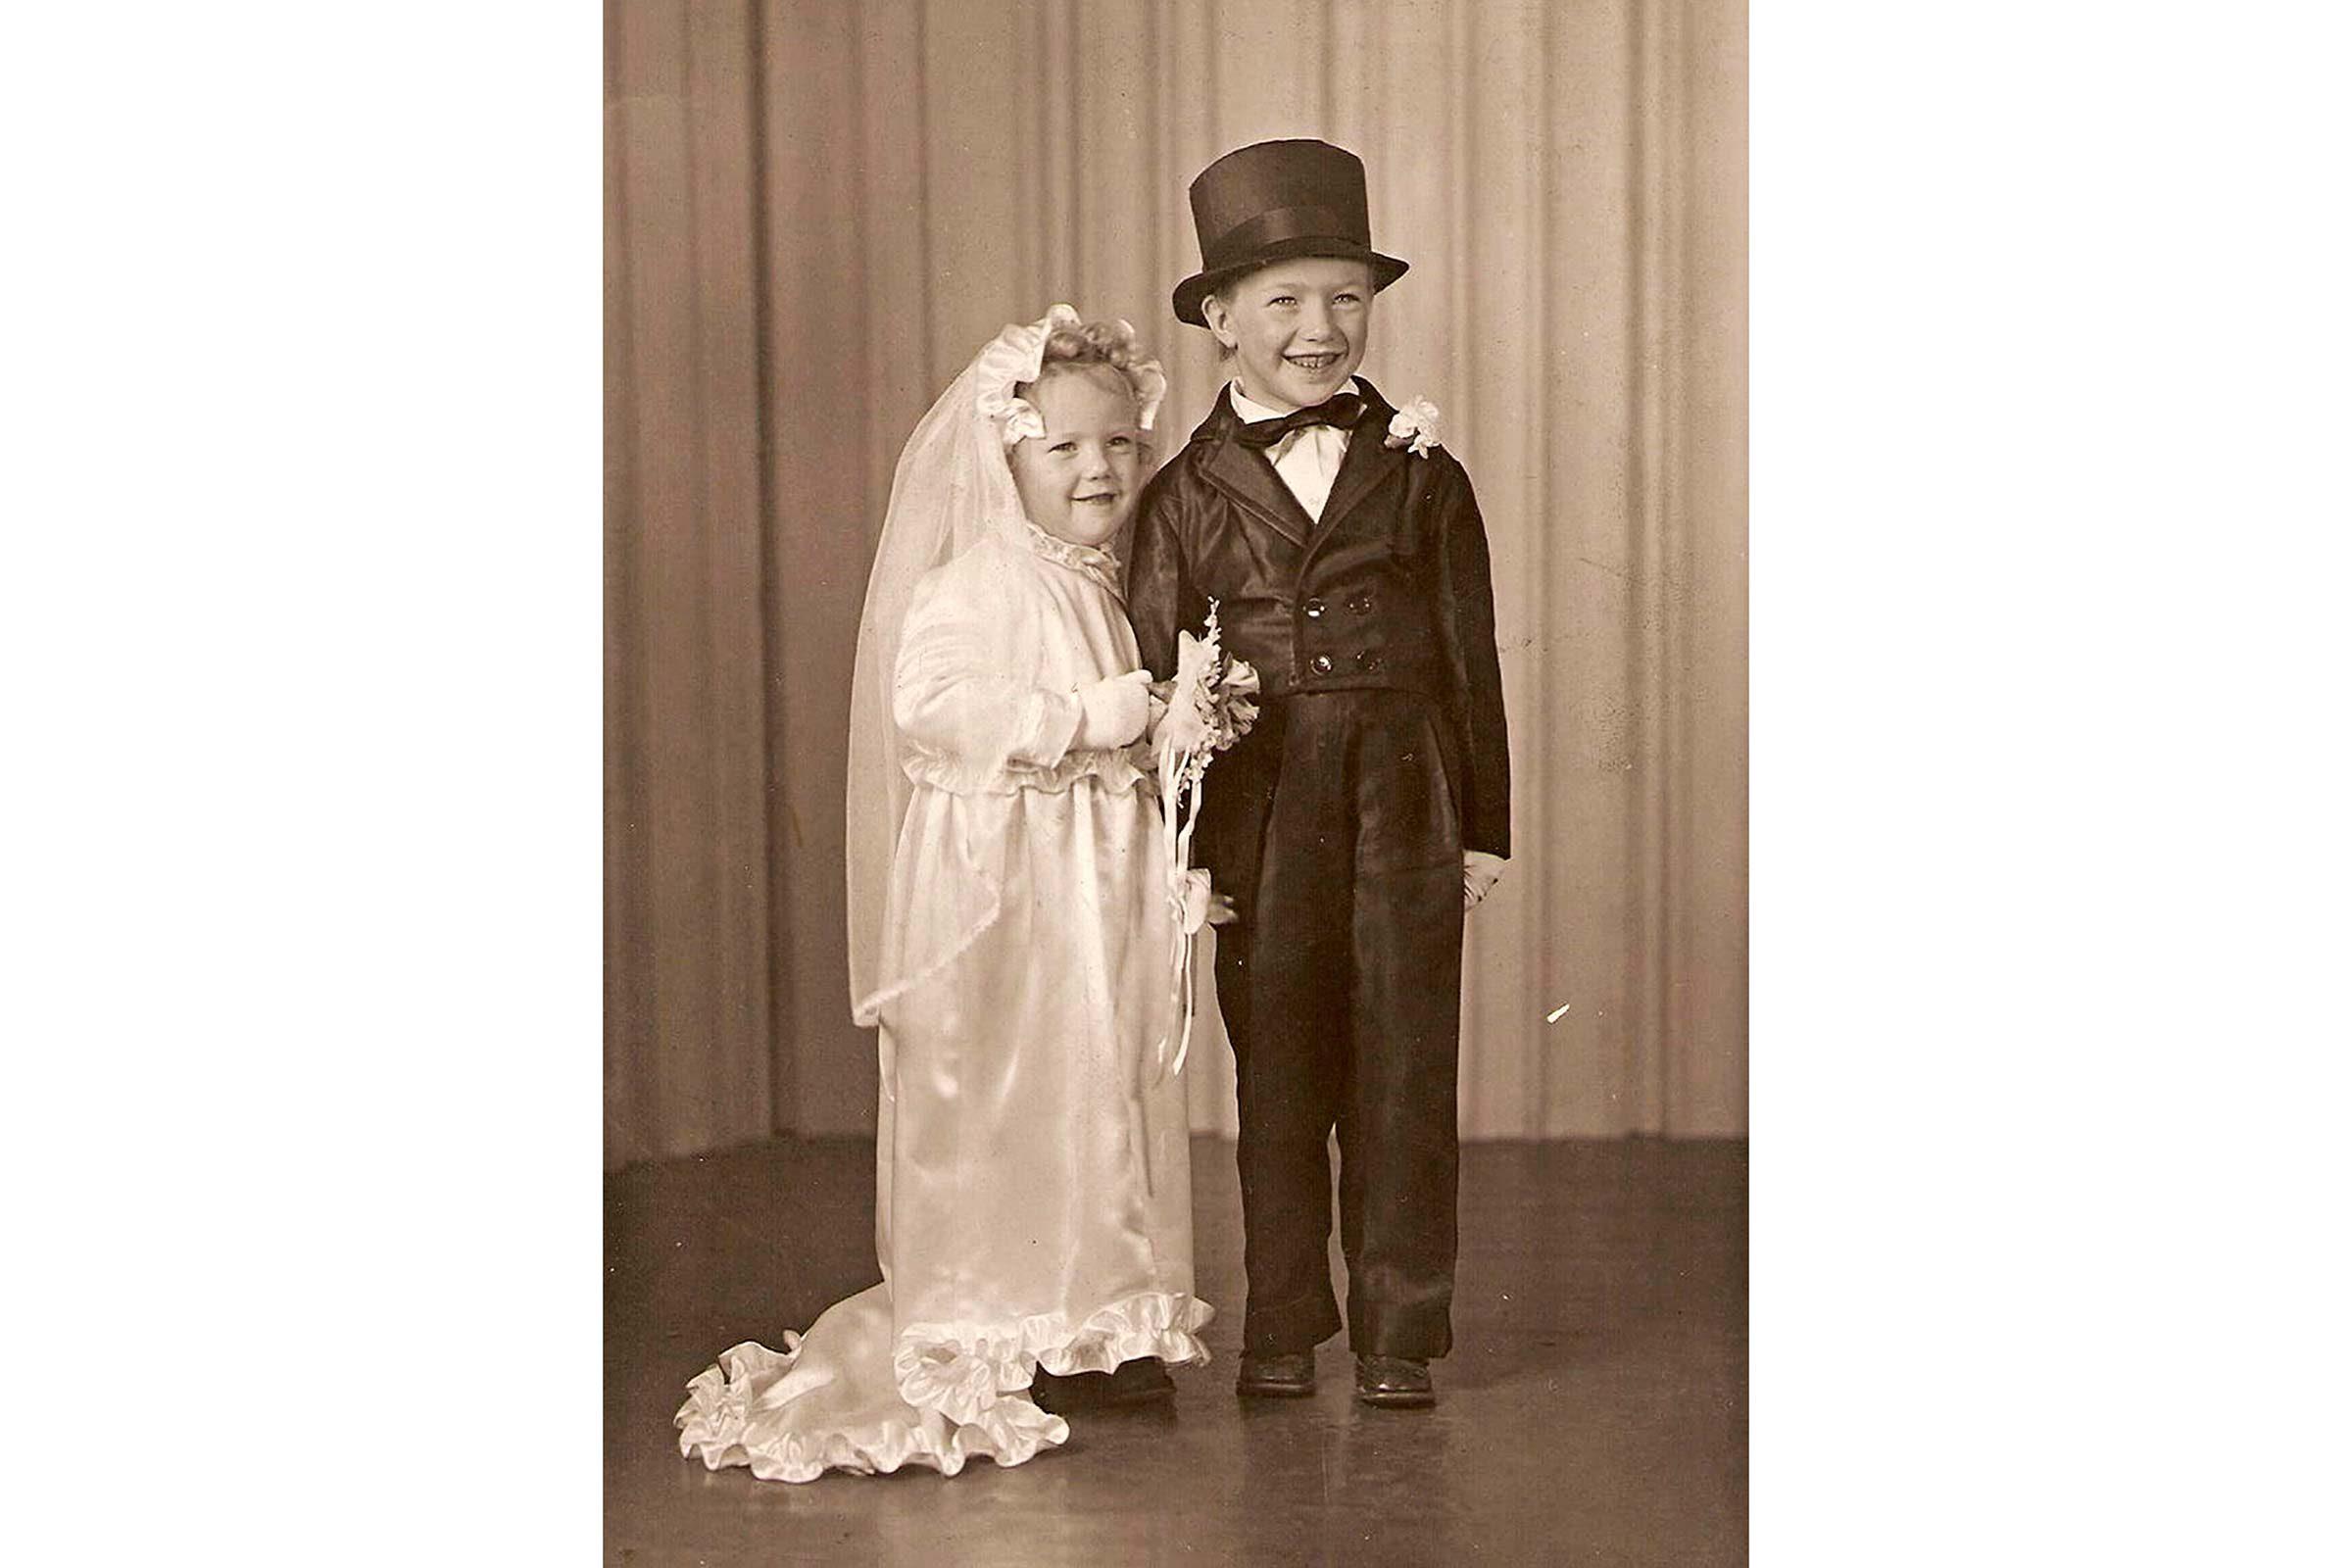 Bride and groom (1950)  sc 1 st  Readeru0027s Digest & Charming Vintage Halloween Photos | Readeru0027s Digest